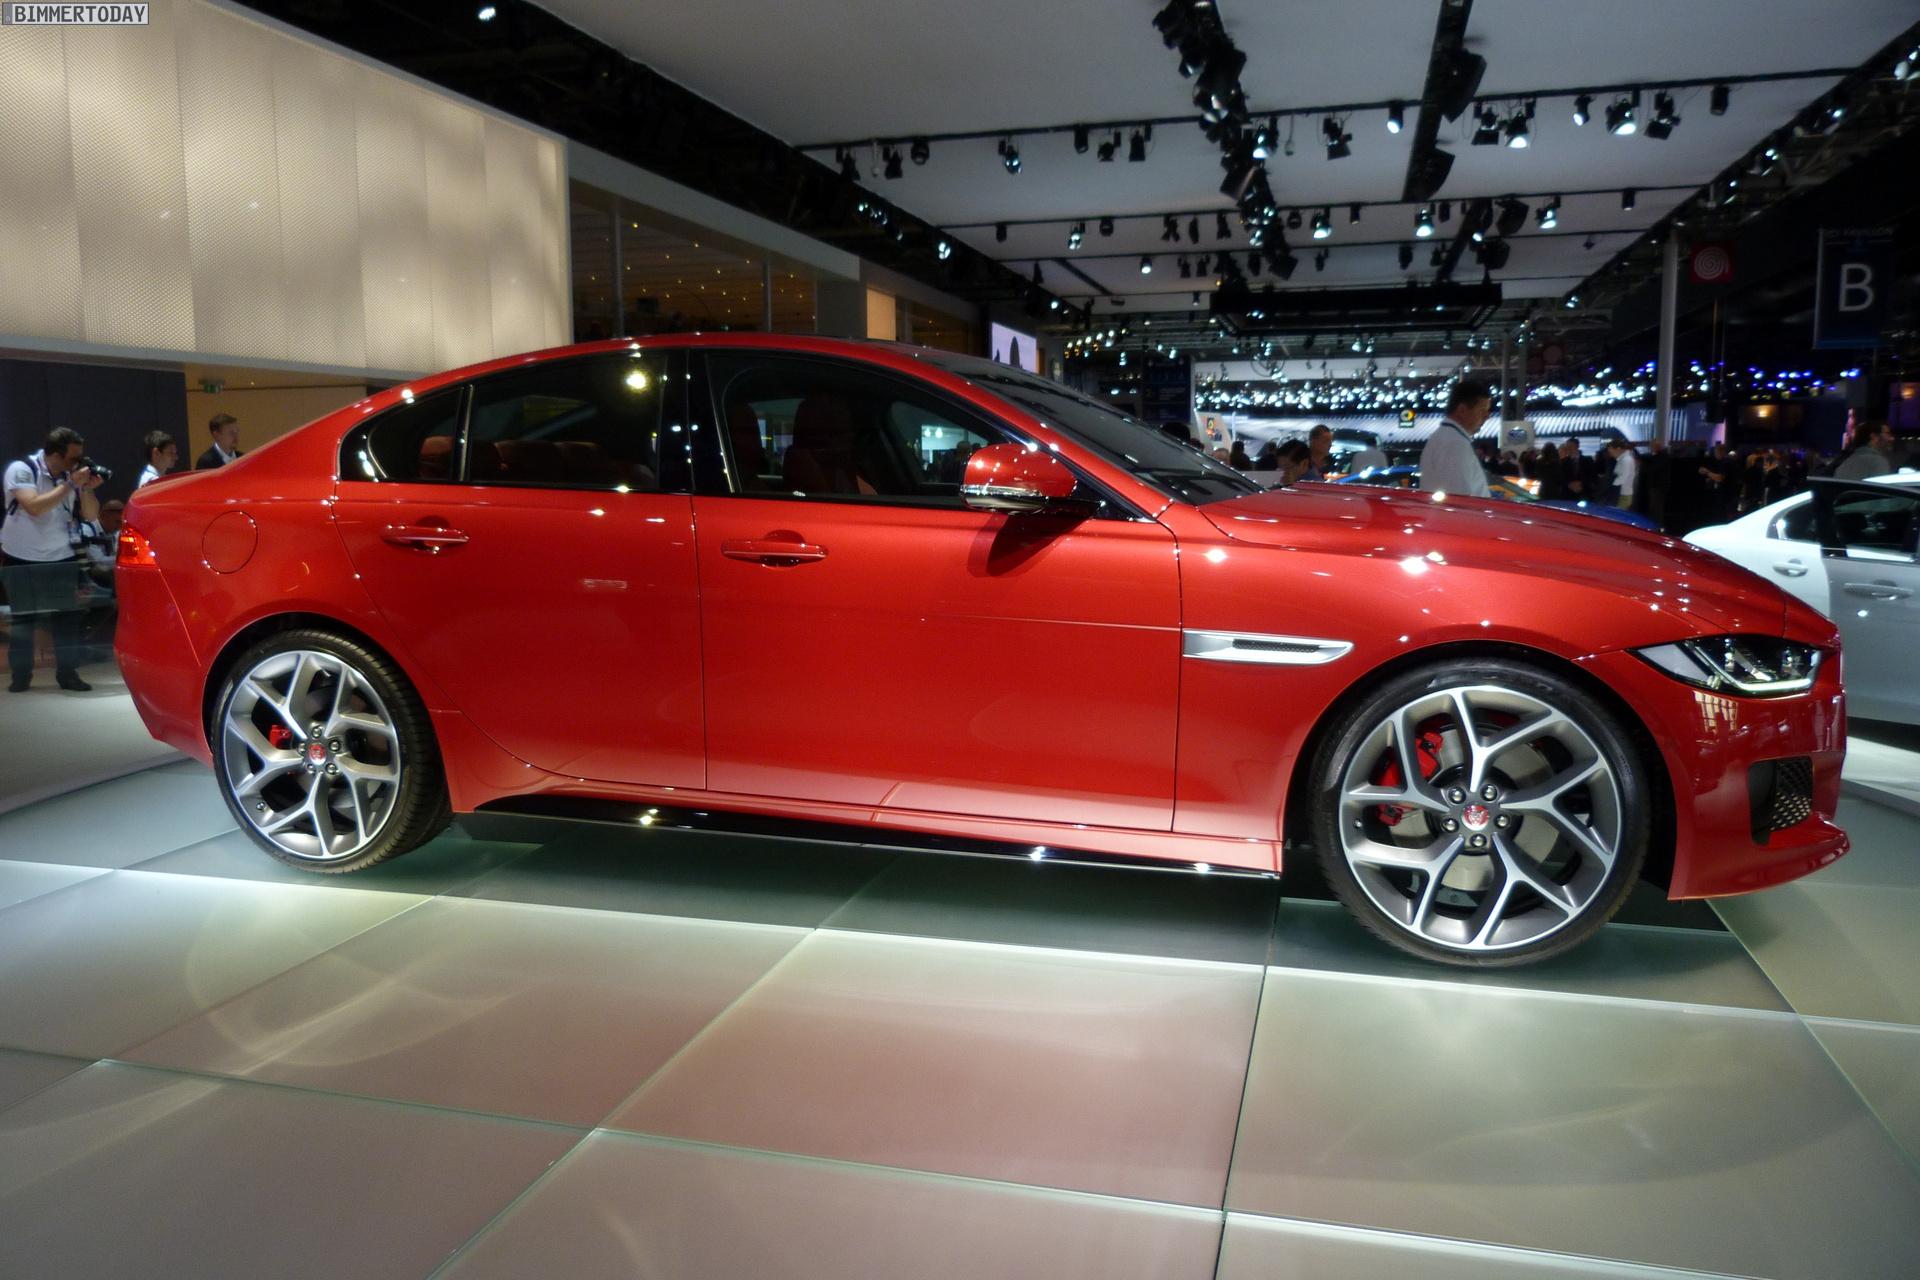 2014 Paris Motor Show: Jaguar XE, a 3 Series competitor, makes its debut